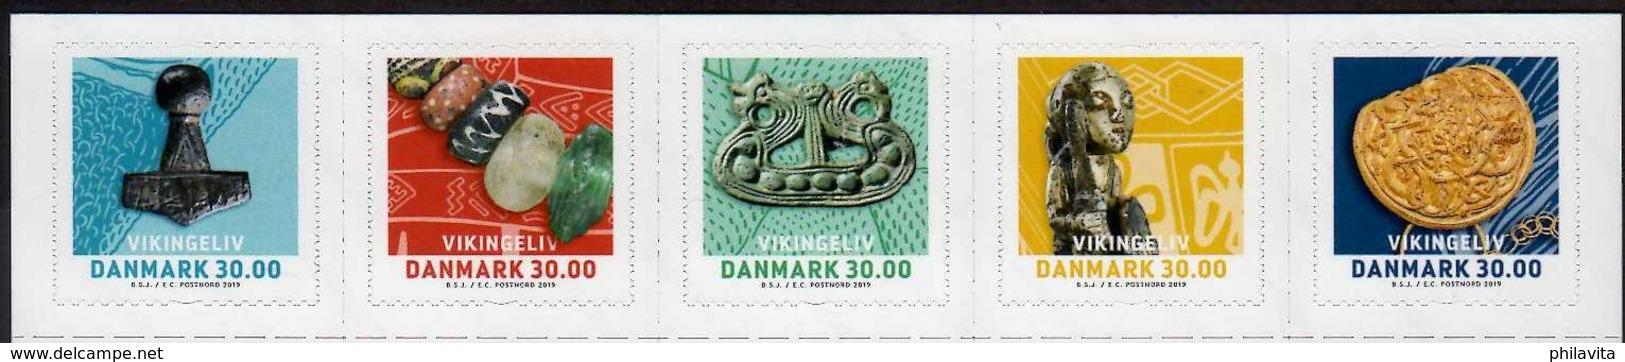 2019 Denmark -Archeology - Viking Treasures In Dannish Soil - Set Of 5 V MNH** Coints,  Cloth, Juwelery, Sword - Archäologie